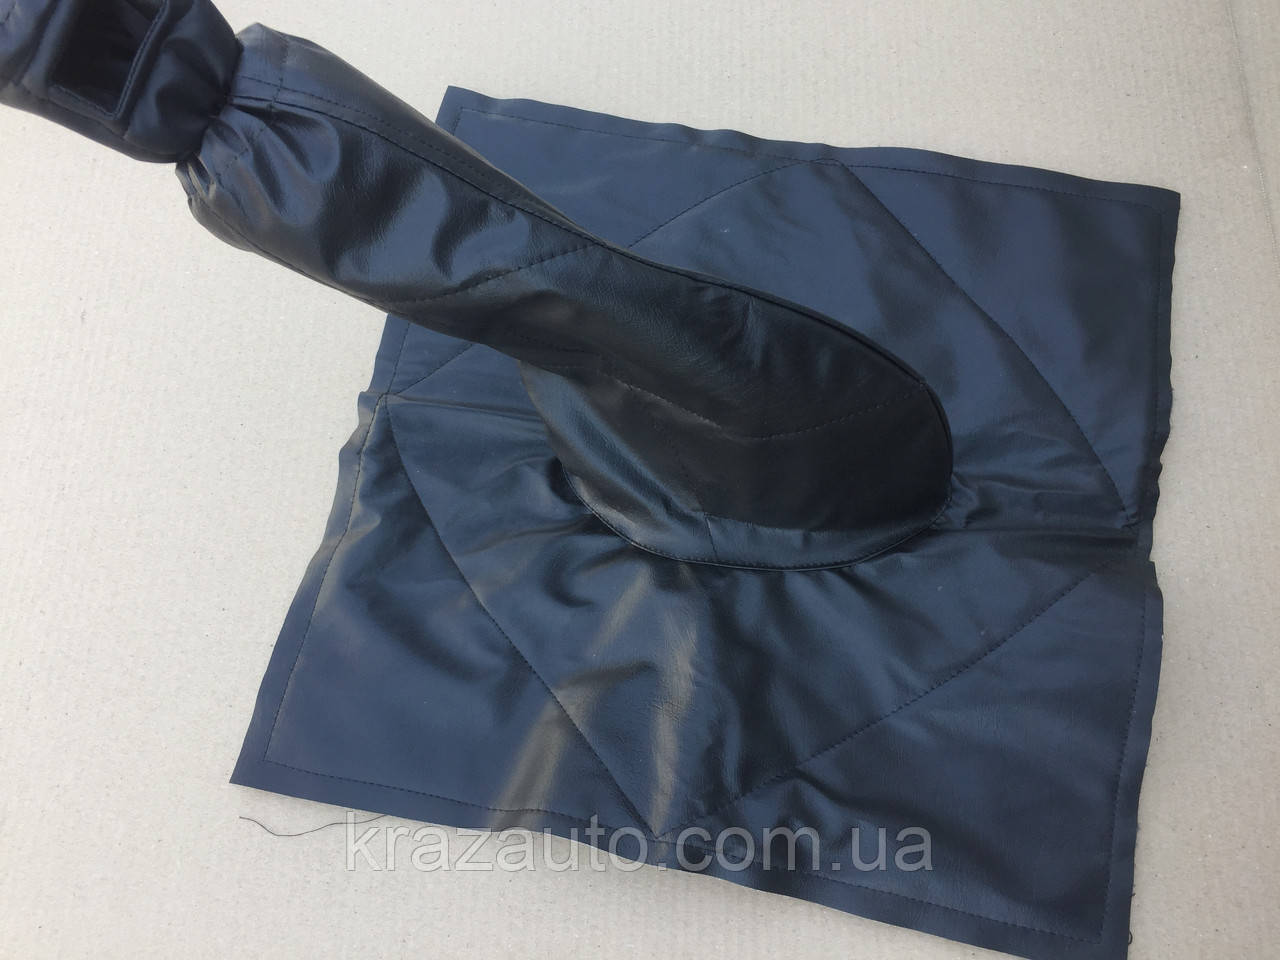 Чехол рычага КПП КАМАЗ ЕВРО 53205-5112064